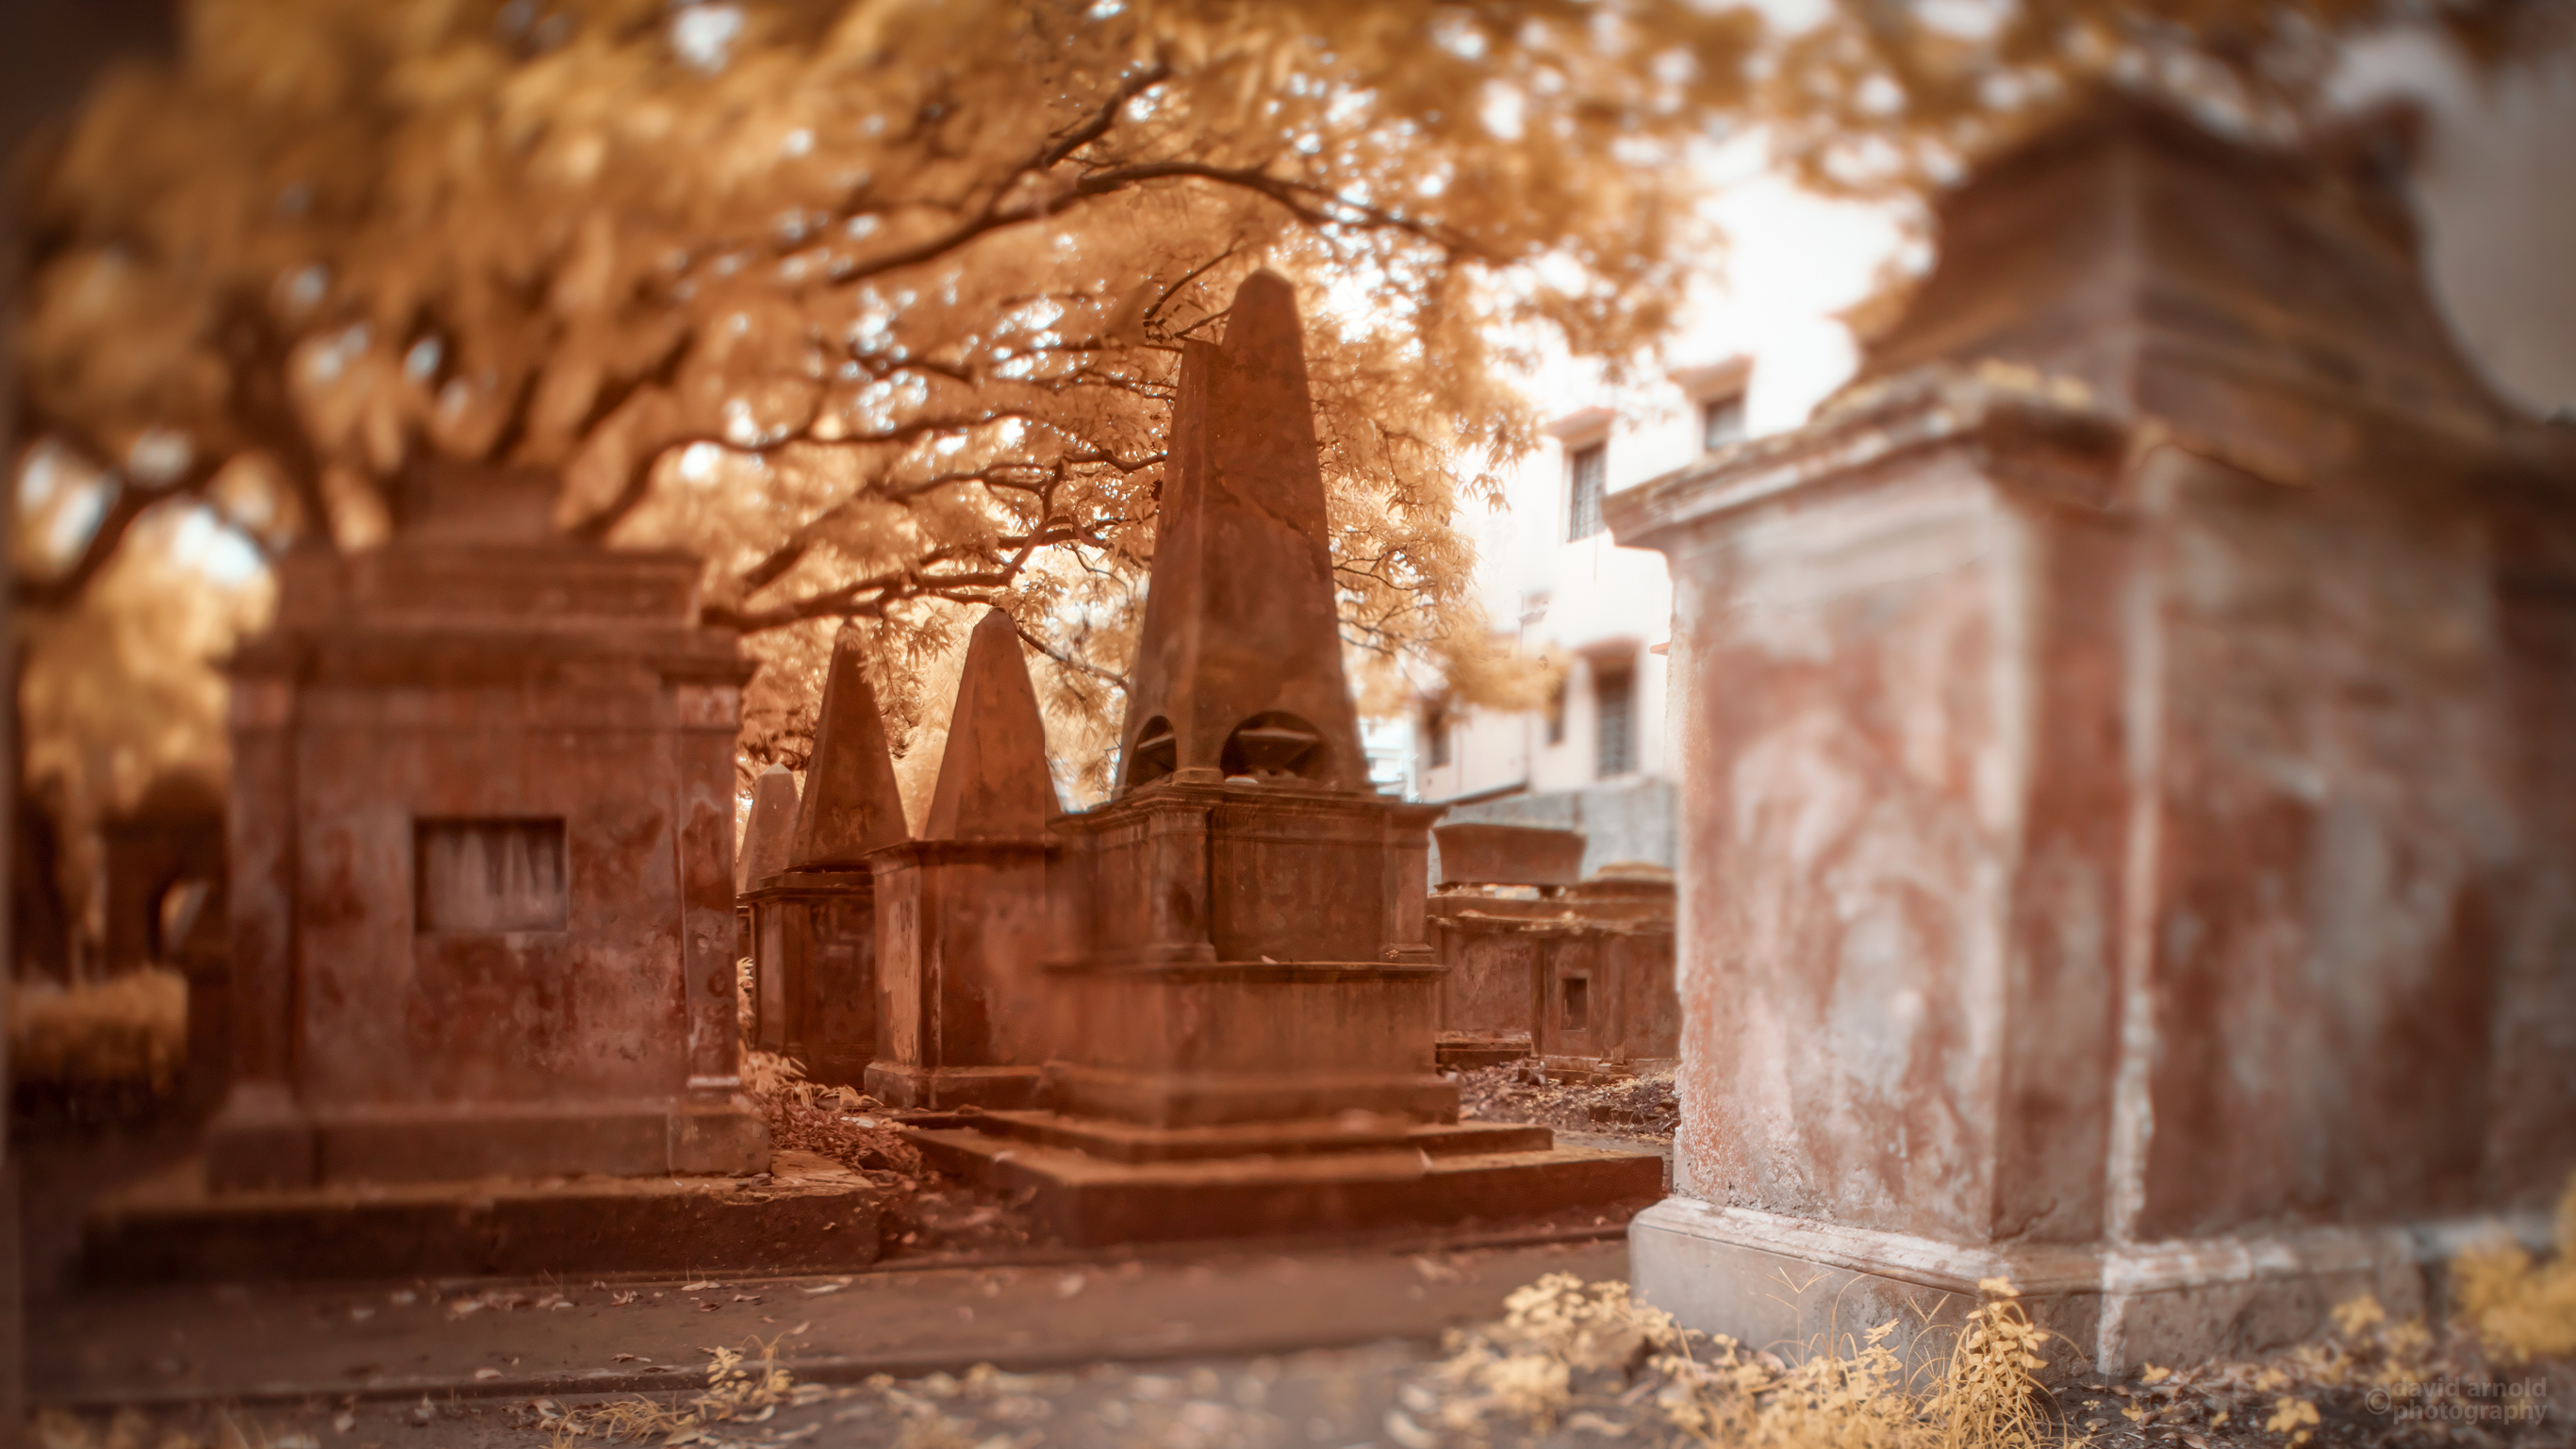 Pyramid Tombs, South Park Street Cemetery, Kolkata, India.